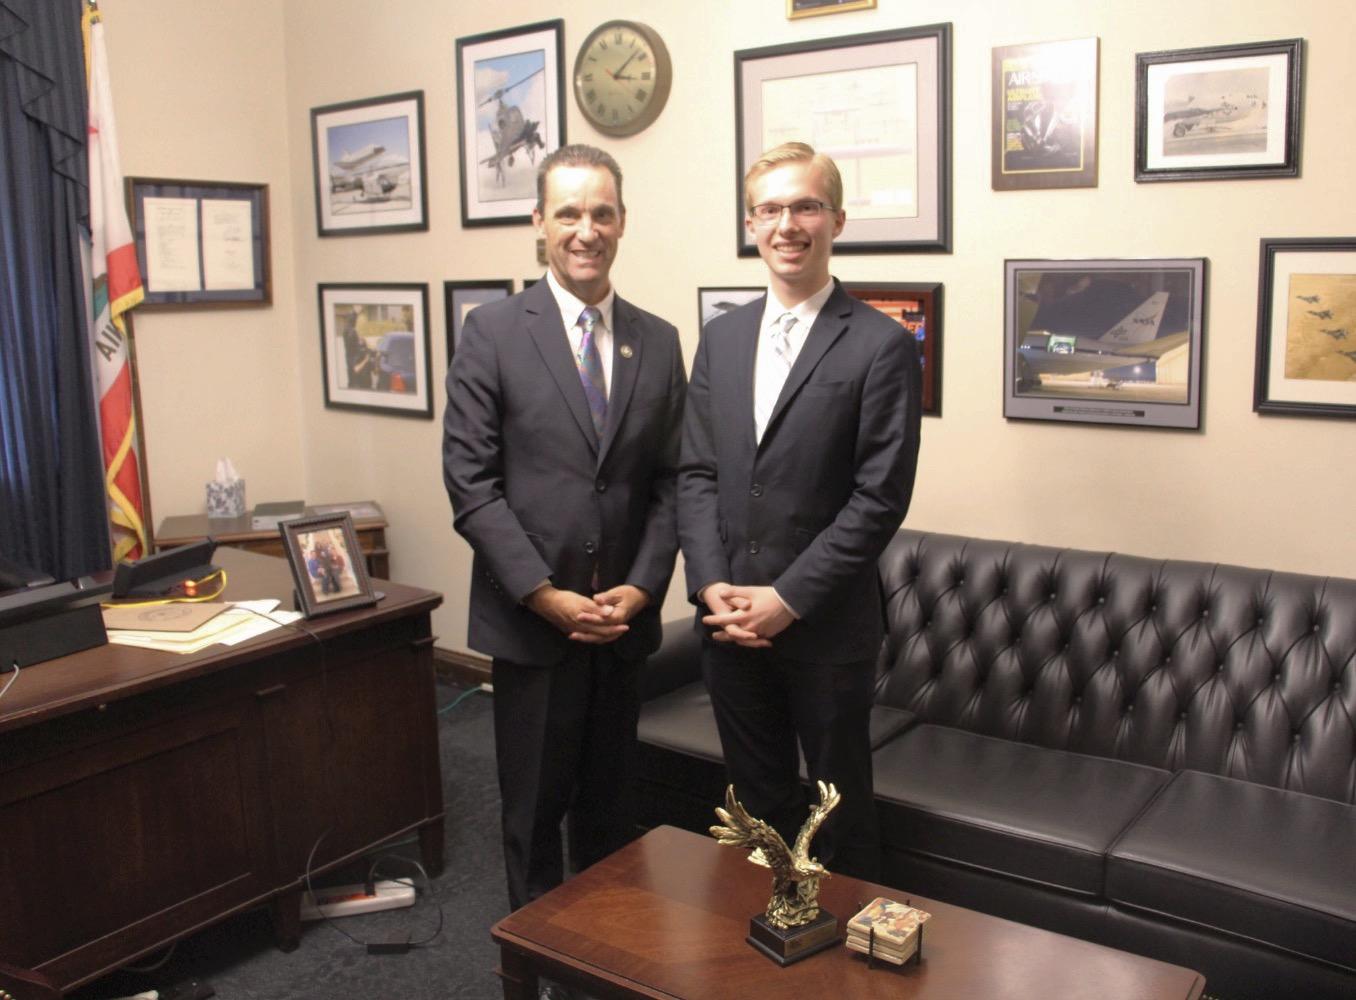 The Congressman and Noah